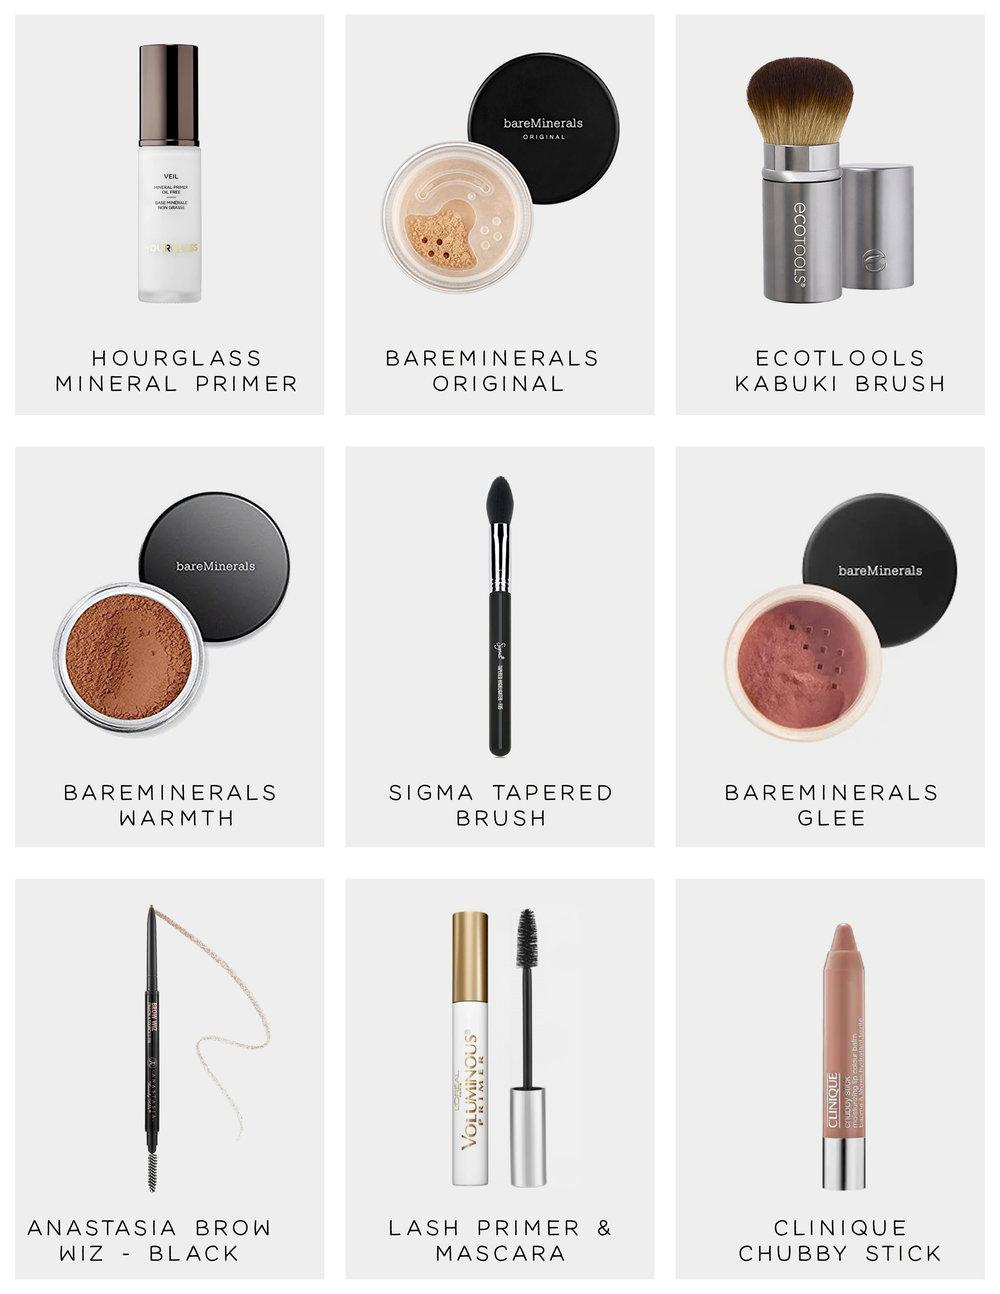 summer-capsule-makeup-bareminerals-original-foundation-bareminerals-warmth-colorscience-mascara.jpg